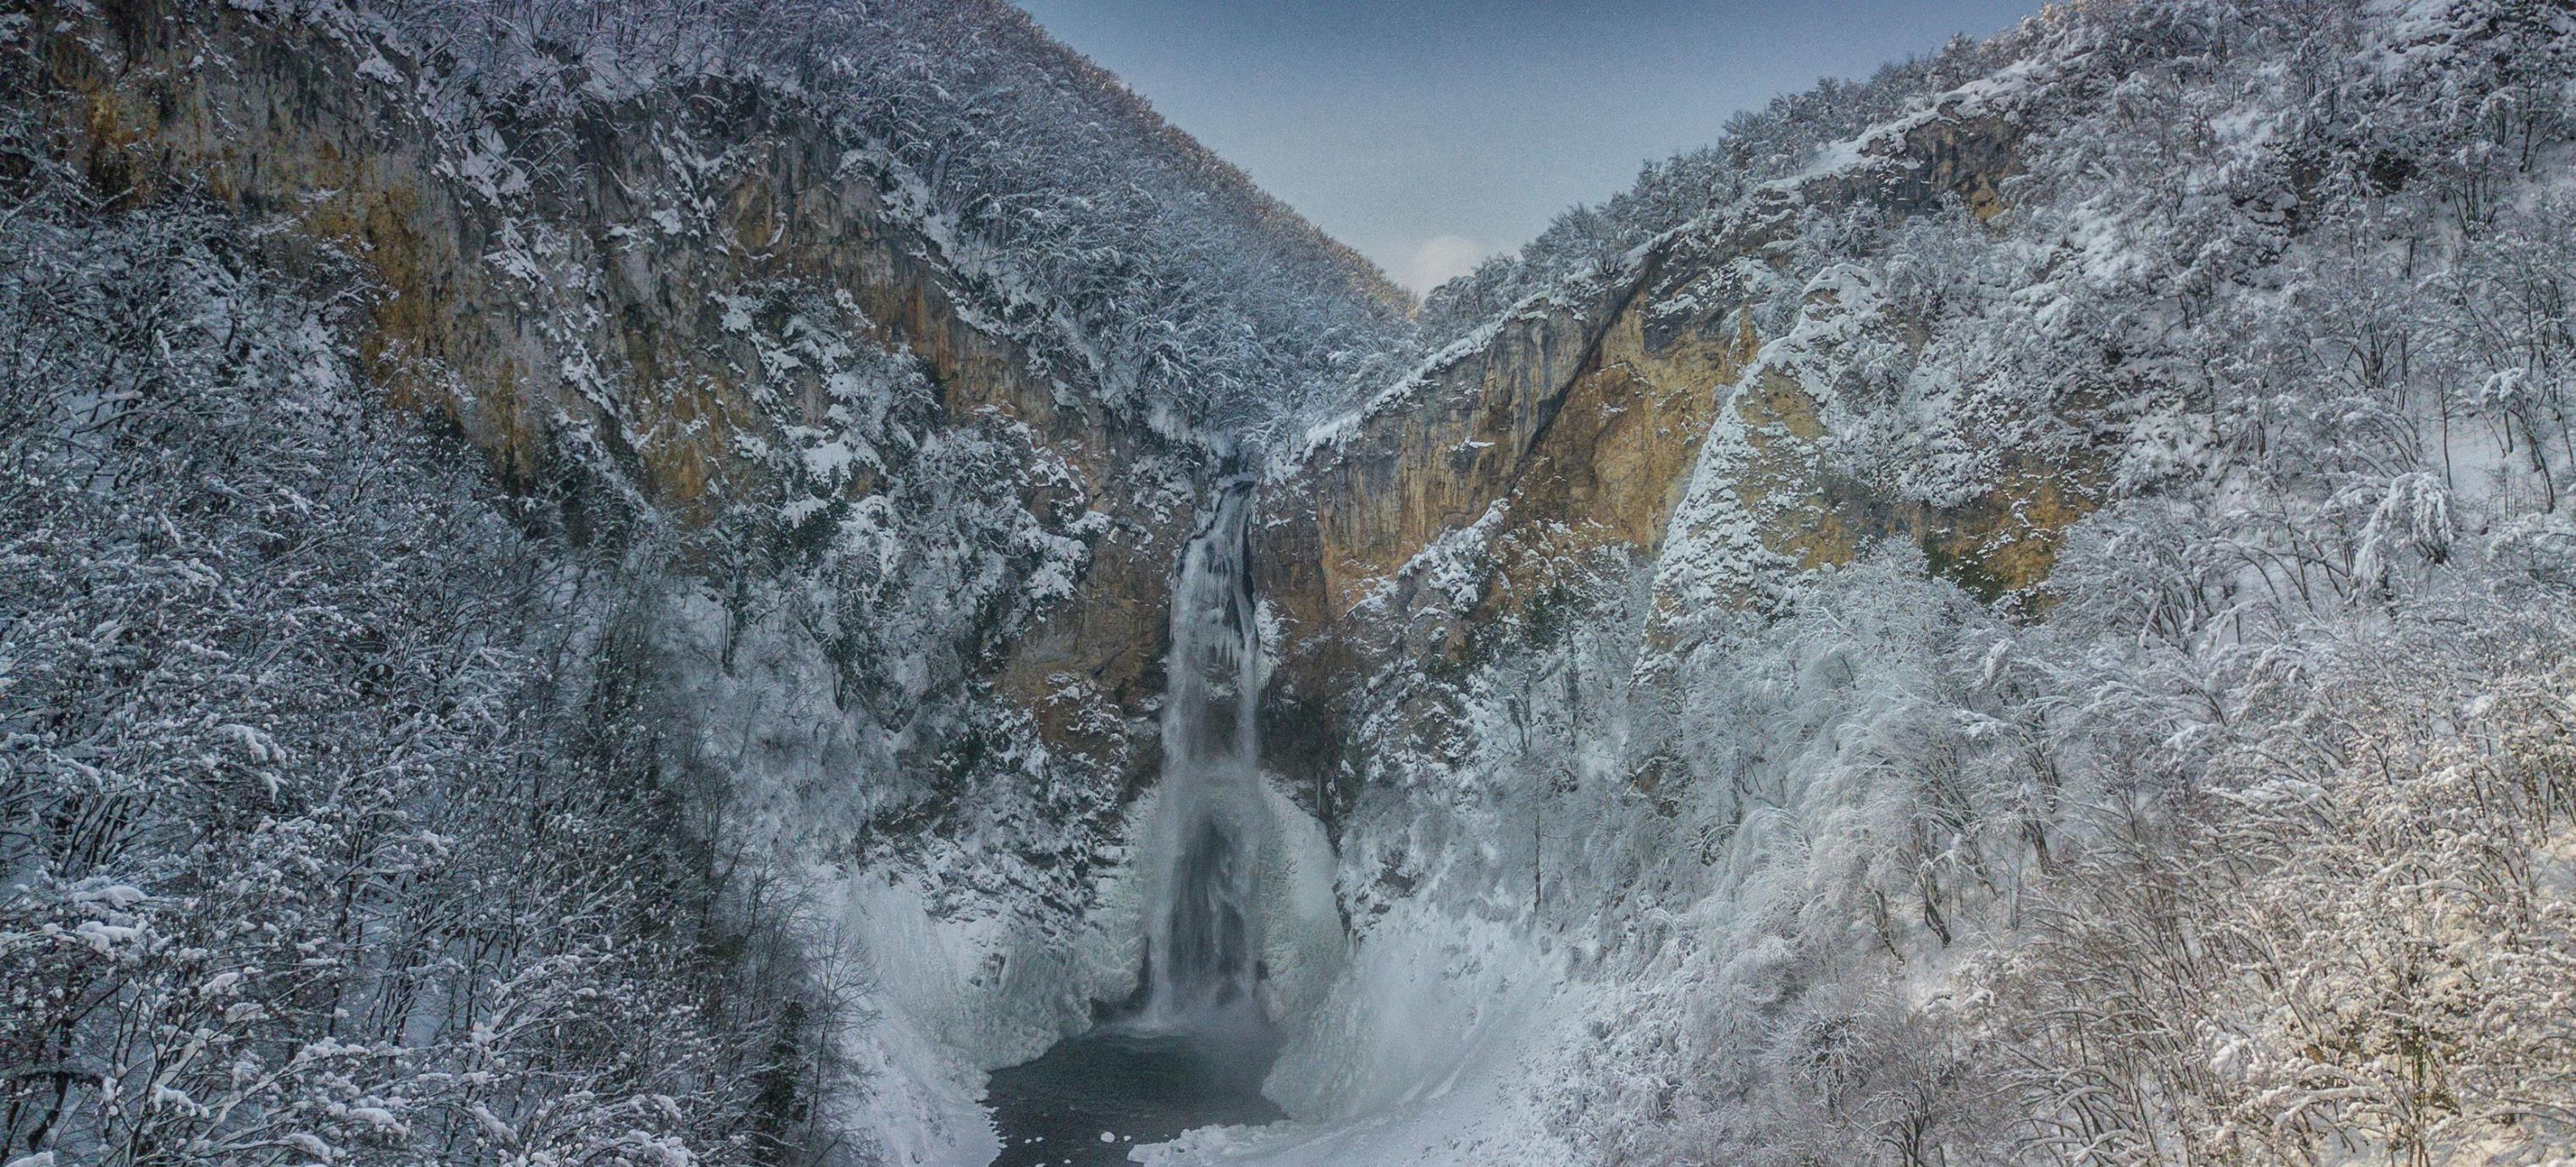 Blihin vodopad / Bliha waterfall VIDEO